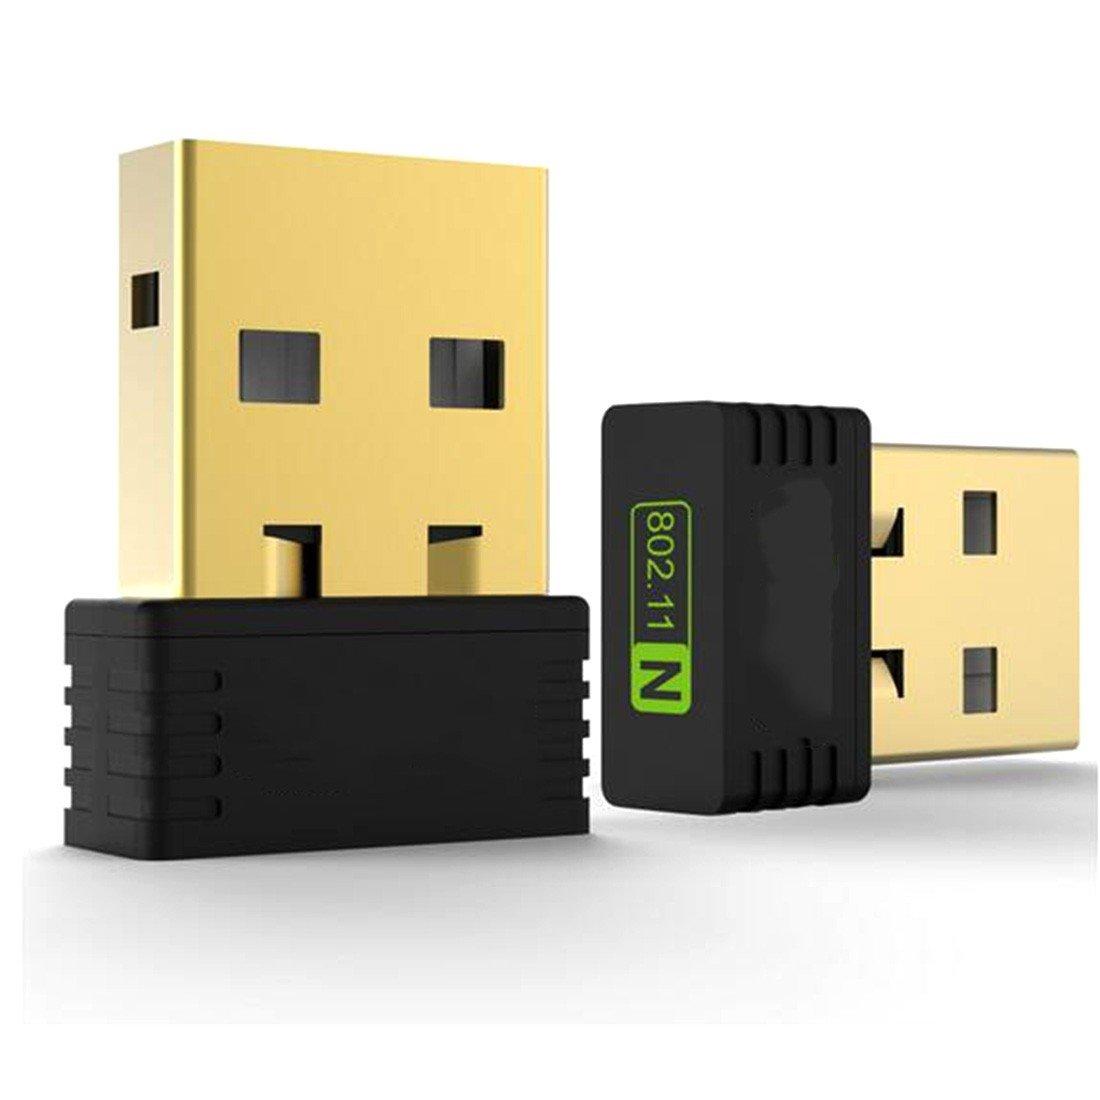 MRLIFY Adaptateur WiFi USB sans Fil Wi-FI 150Mbps Adaptador Adaptateur WiFi Dongle Carte ré seau 802.11n / g/b LAN sans Fil Adaptateur WiFi avec antenne